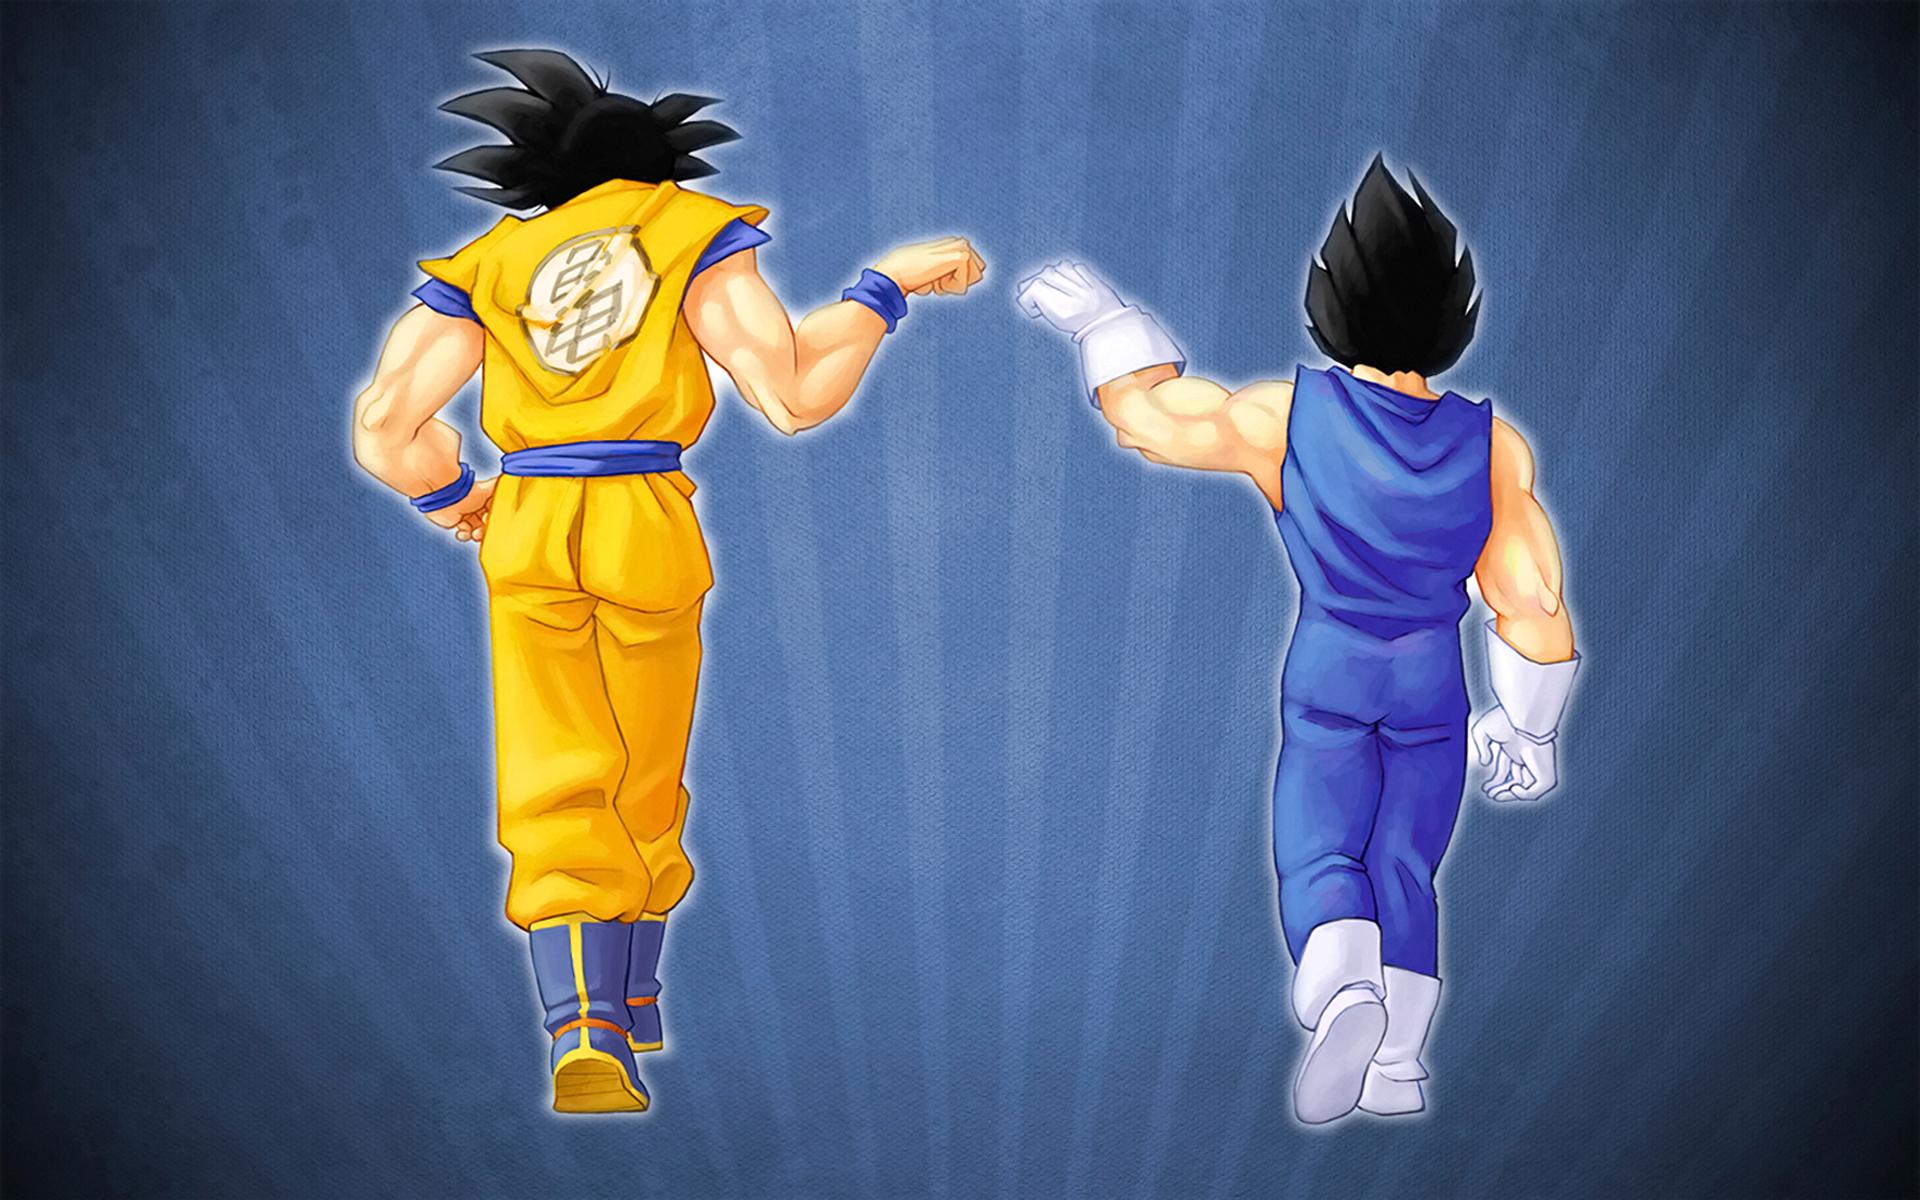 Goku and Vegeta   Dragon Ball Z Widescreen Wallpaper   17590 1920x1200